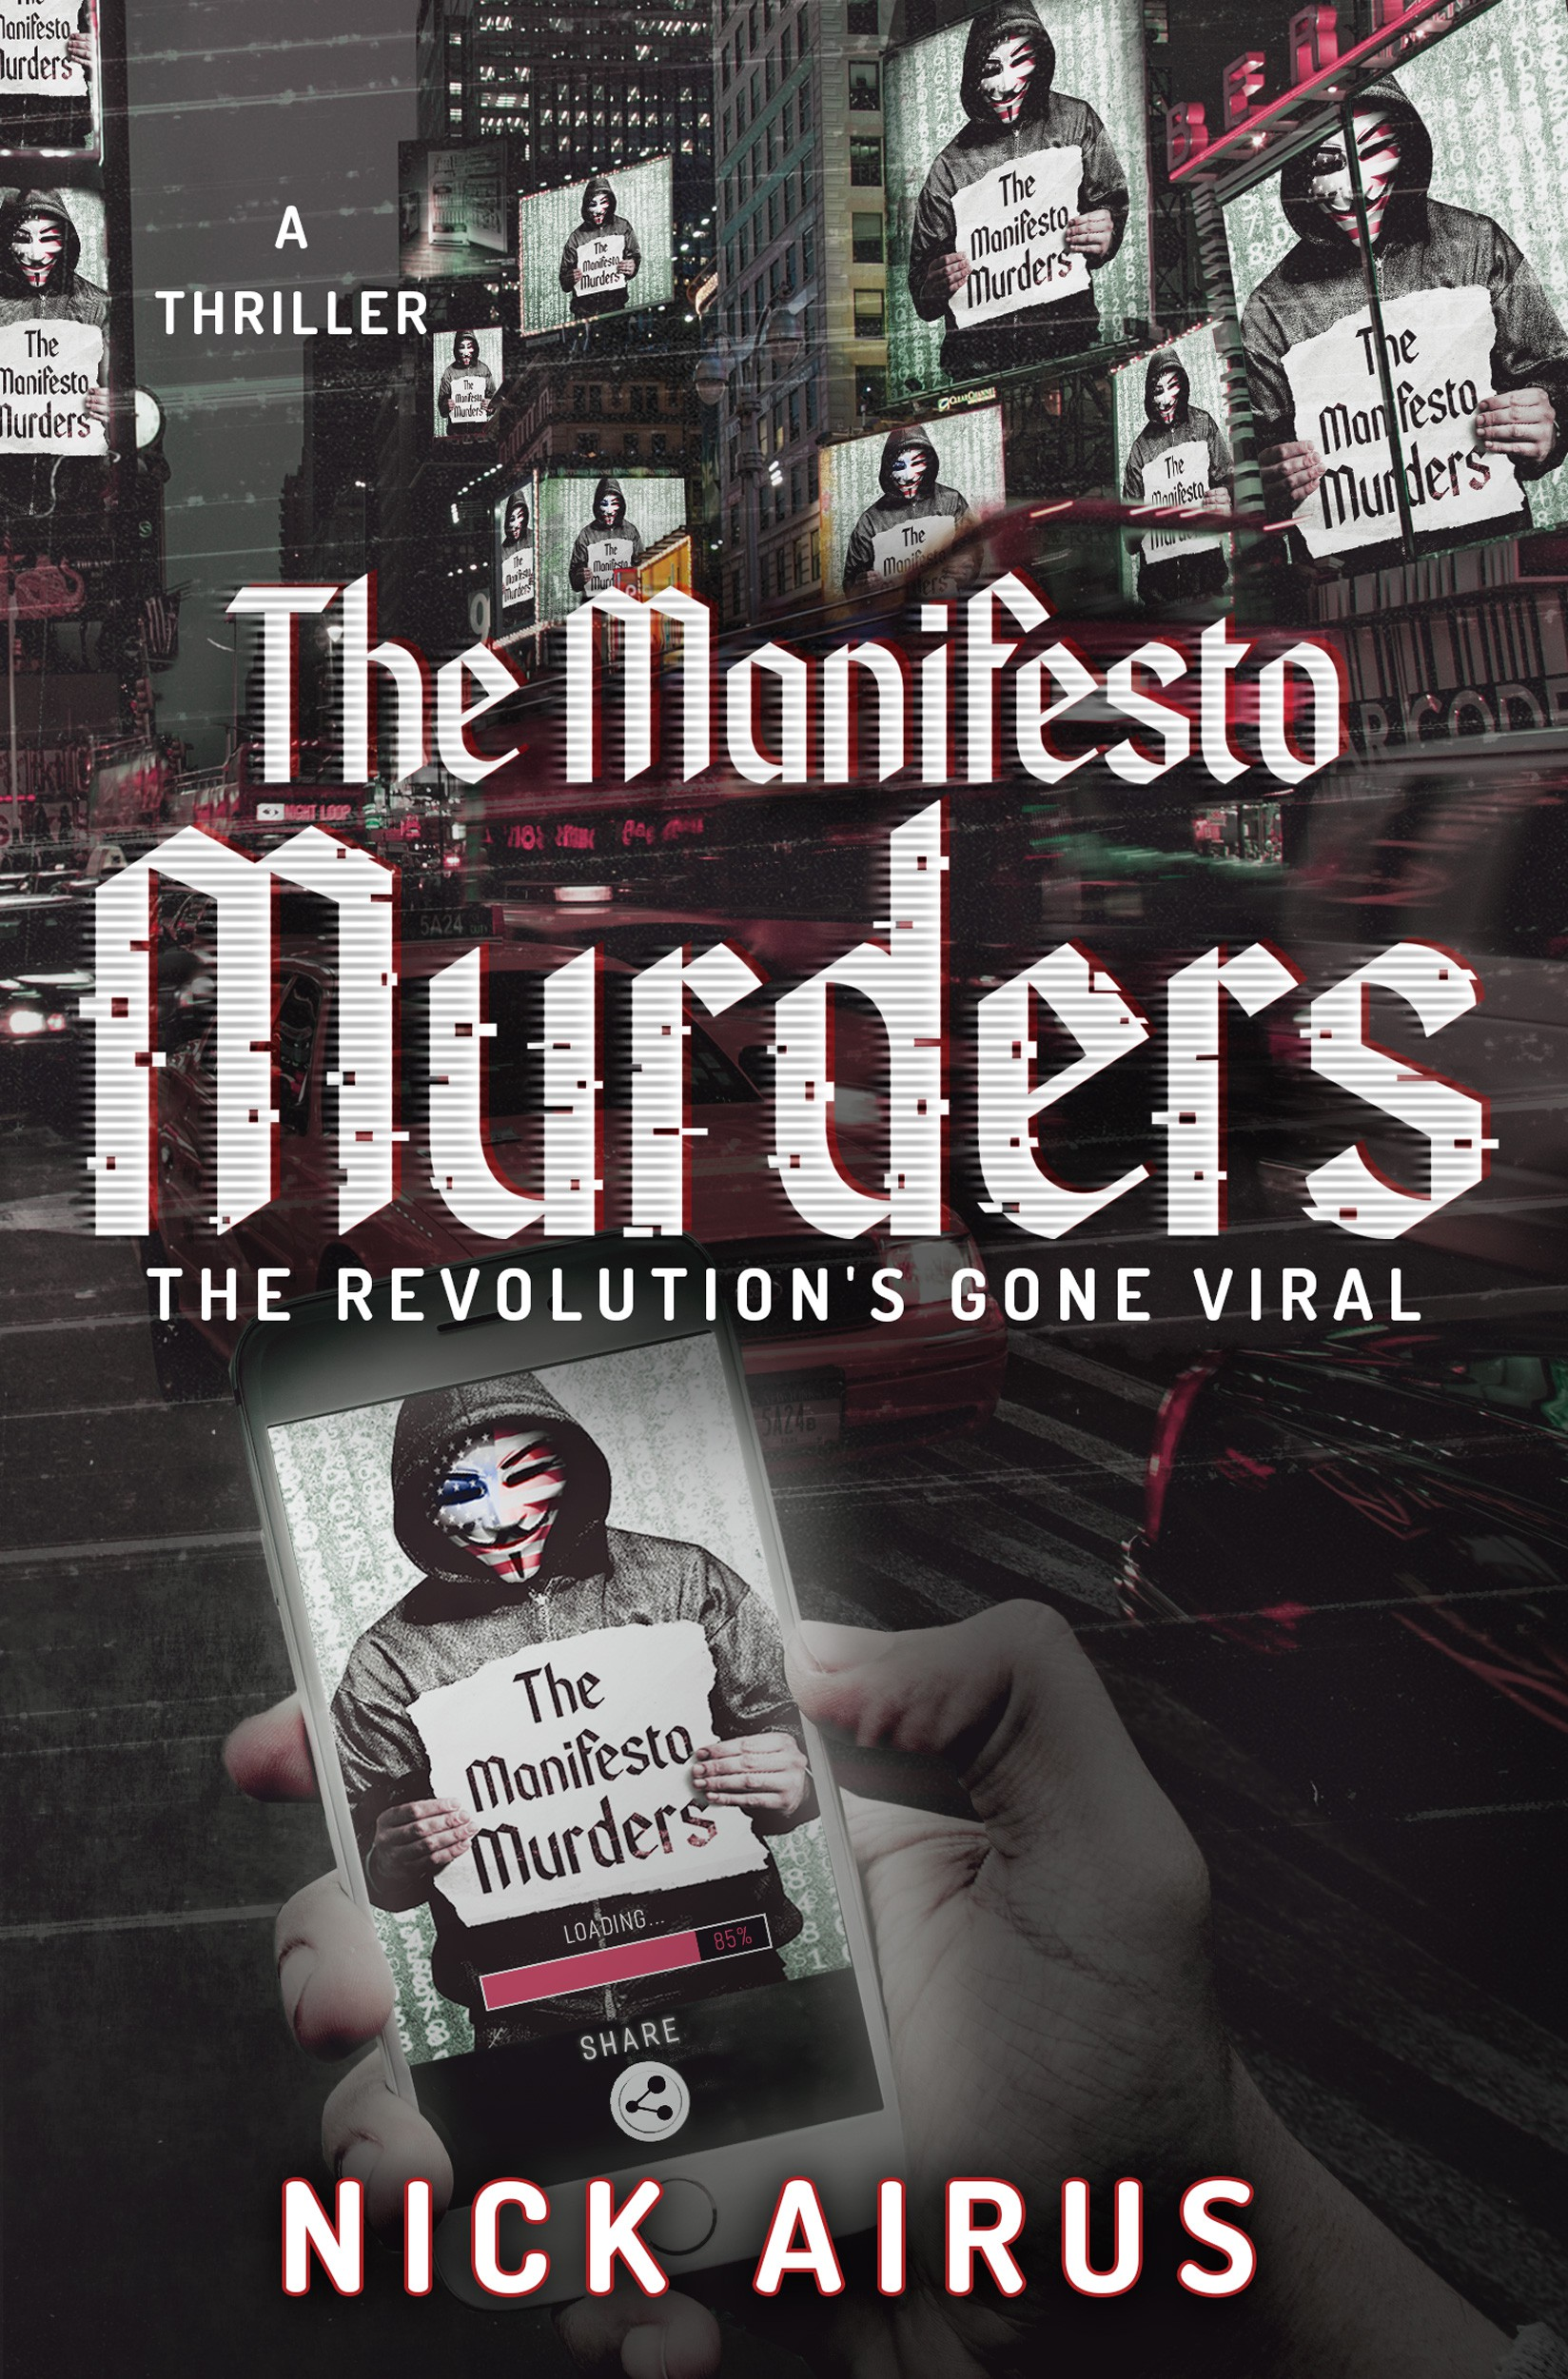 The Manifesto Murders, The Revolution's Gone Viral